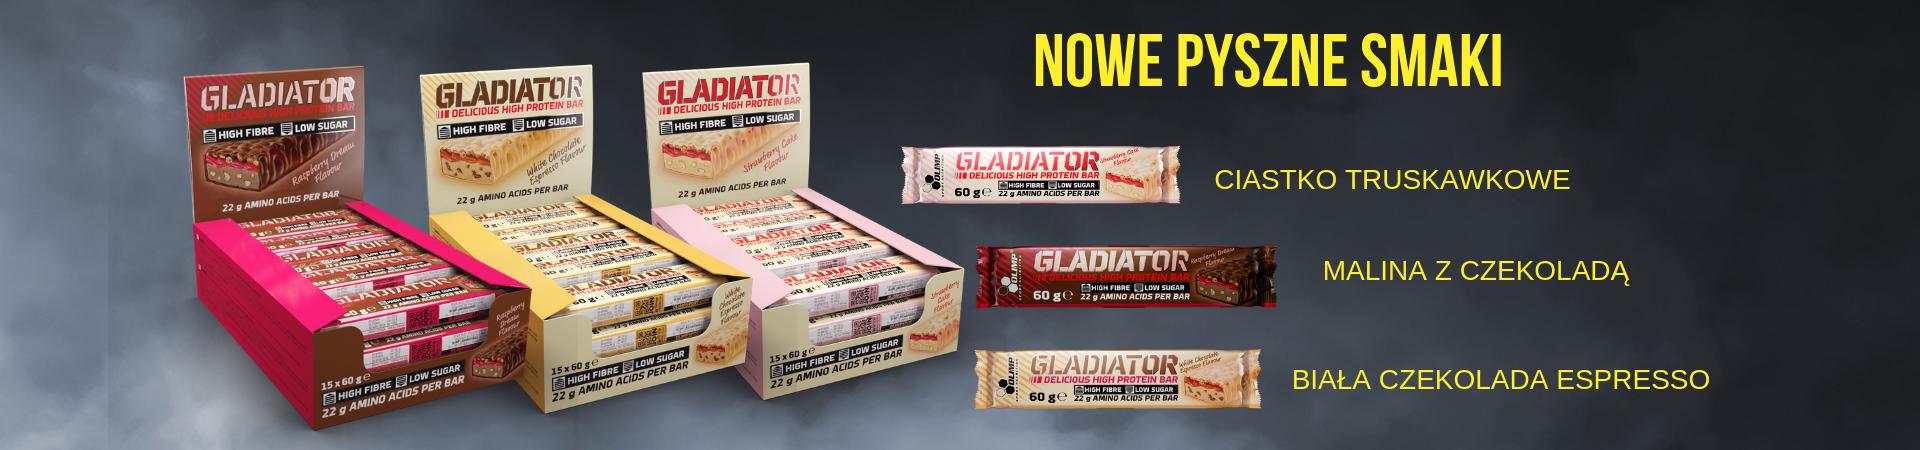 Olimp batony Gladiator